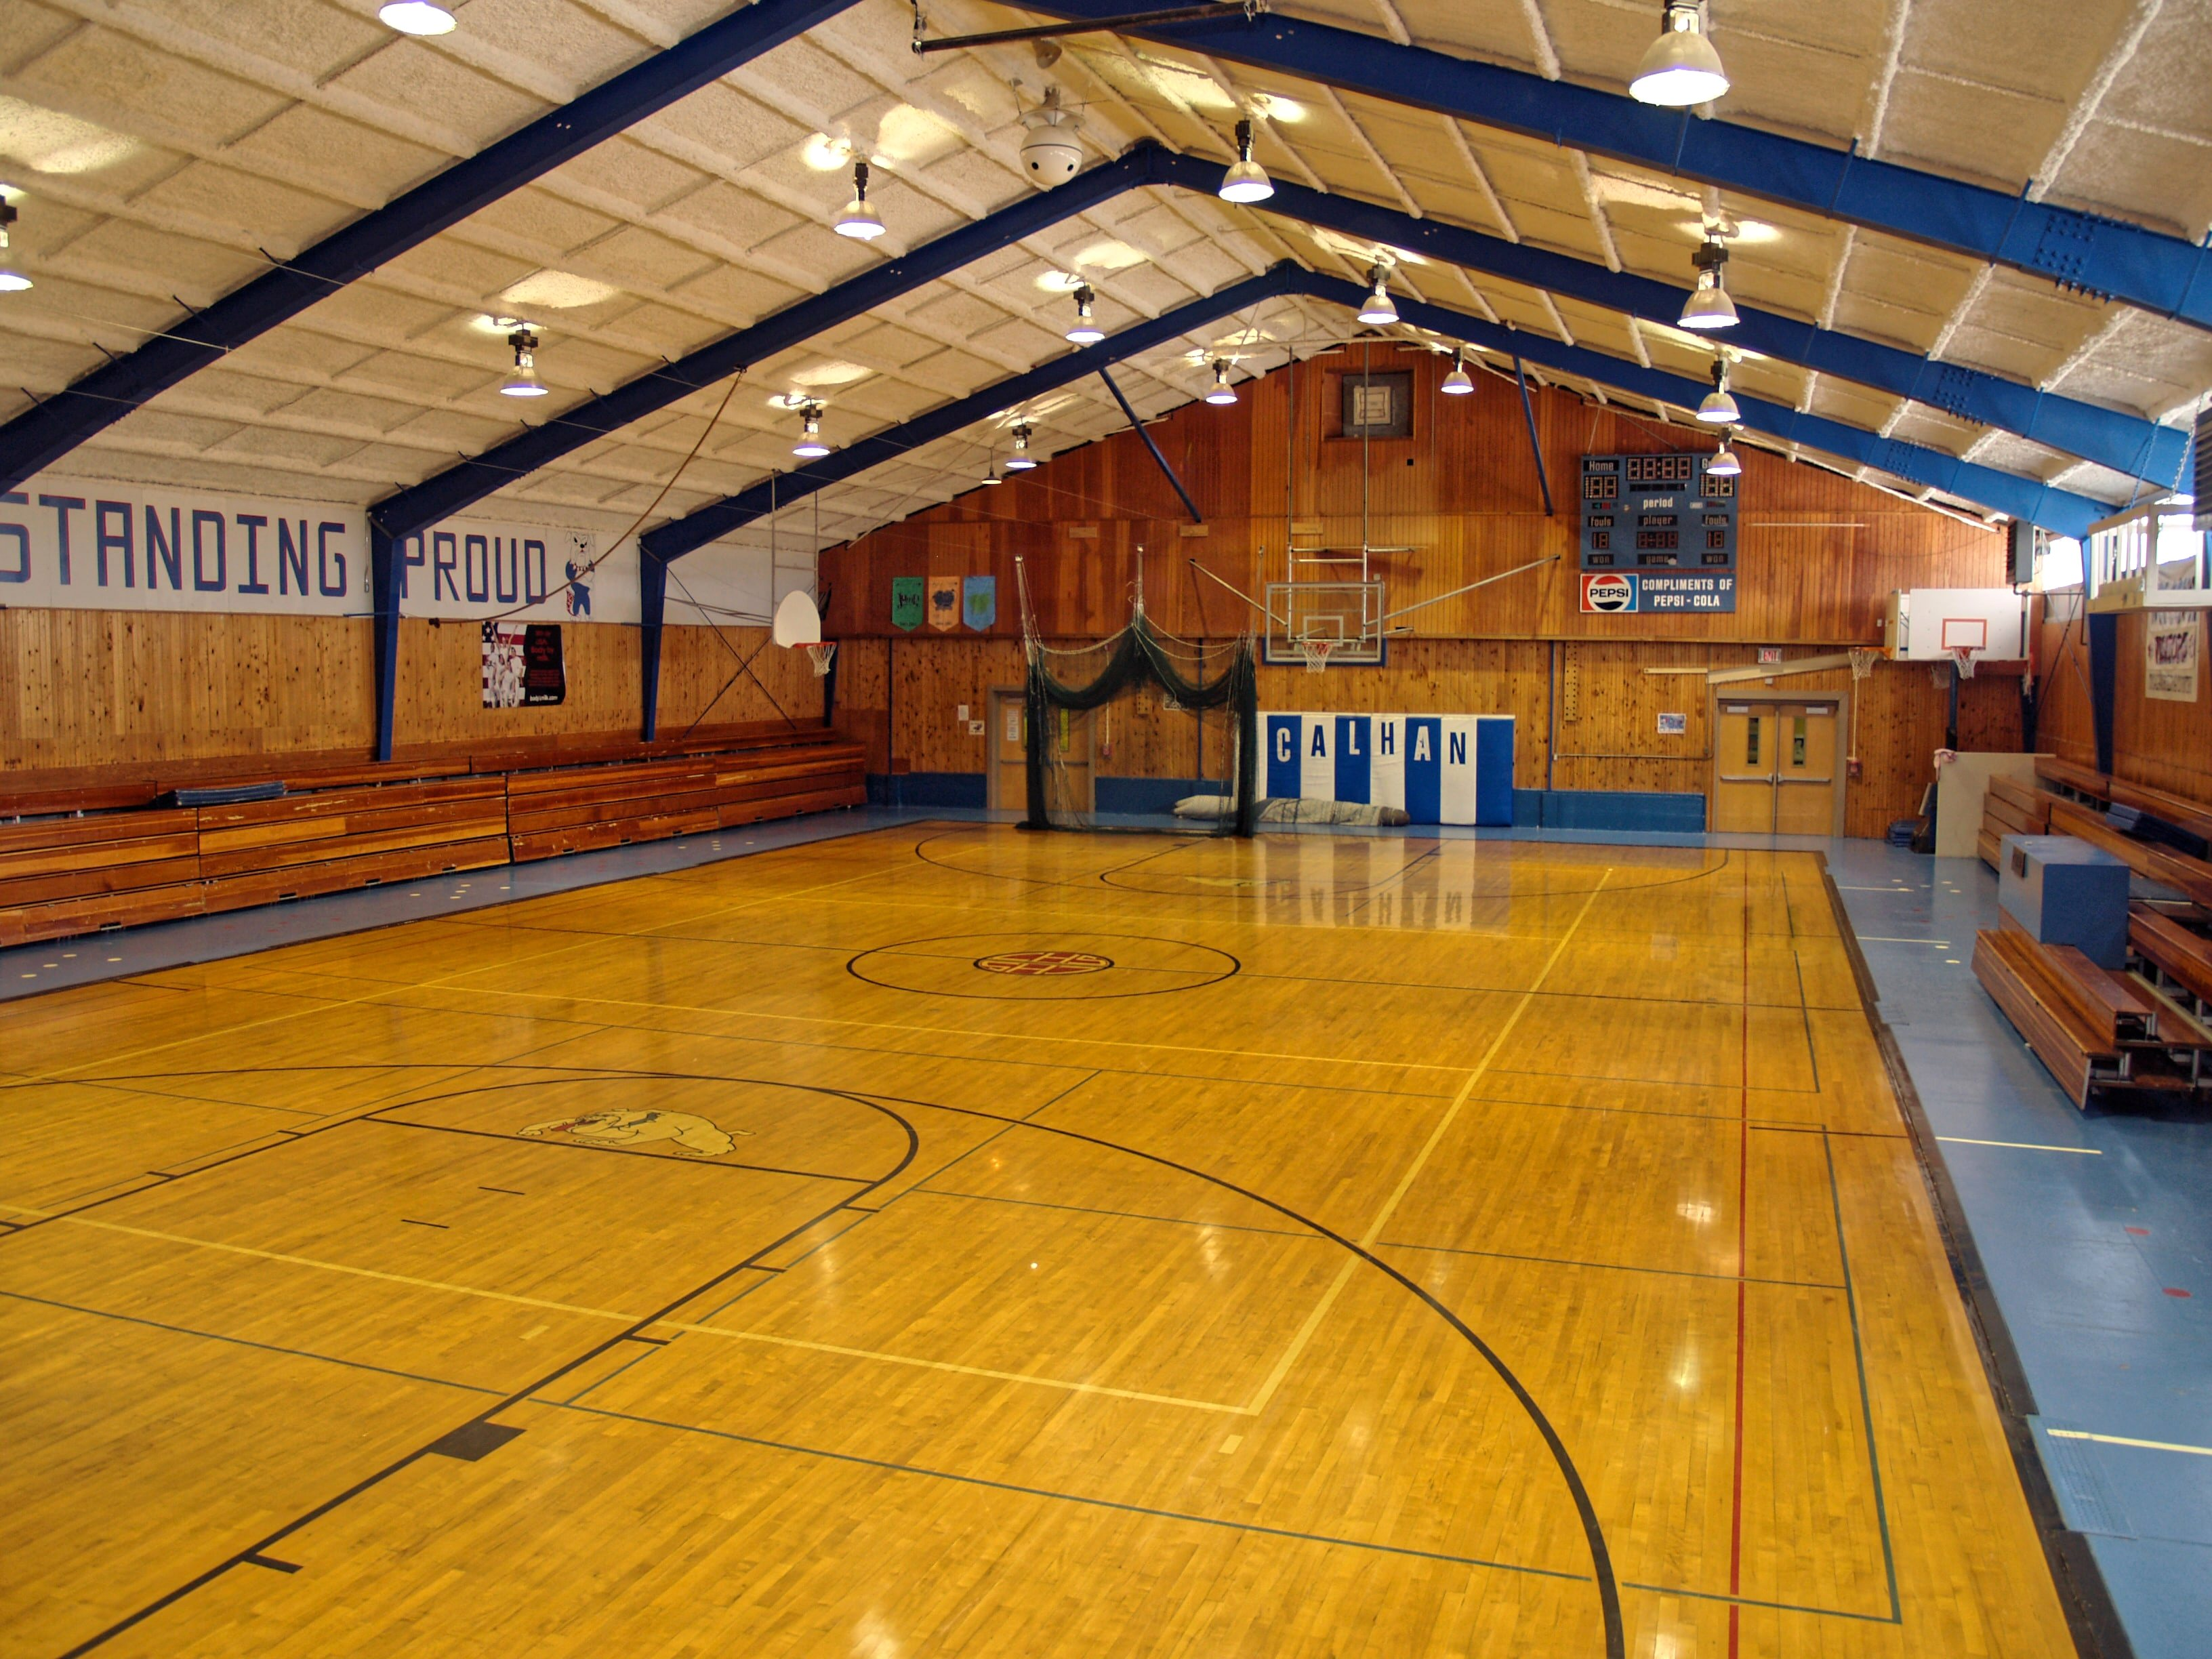 Физкултурния Салон Calhan_Colorado_High_School_Gymnasium_by_David_Shankbone